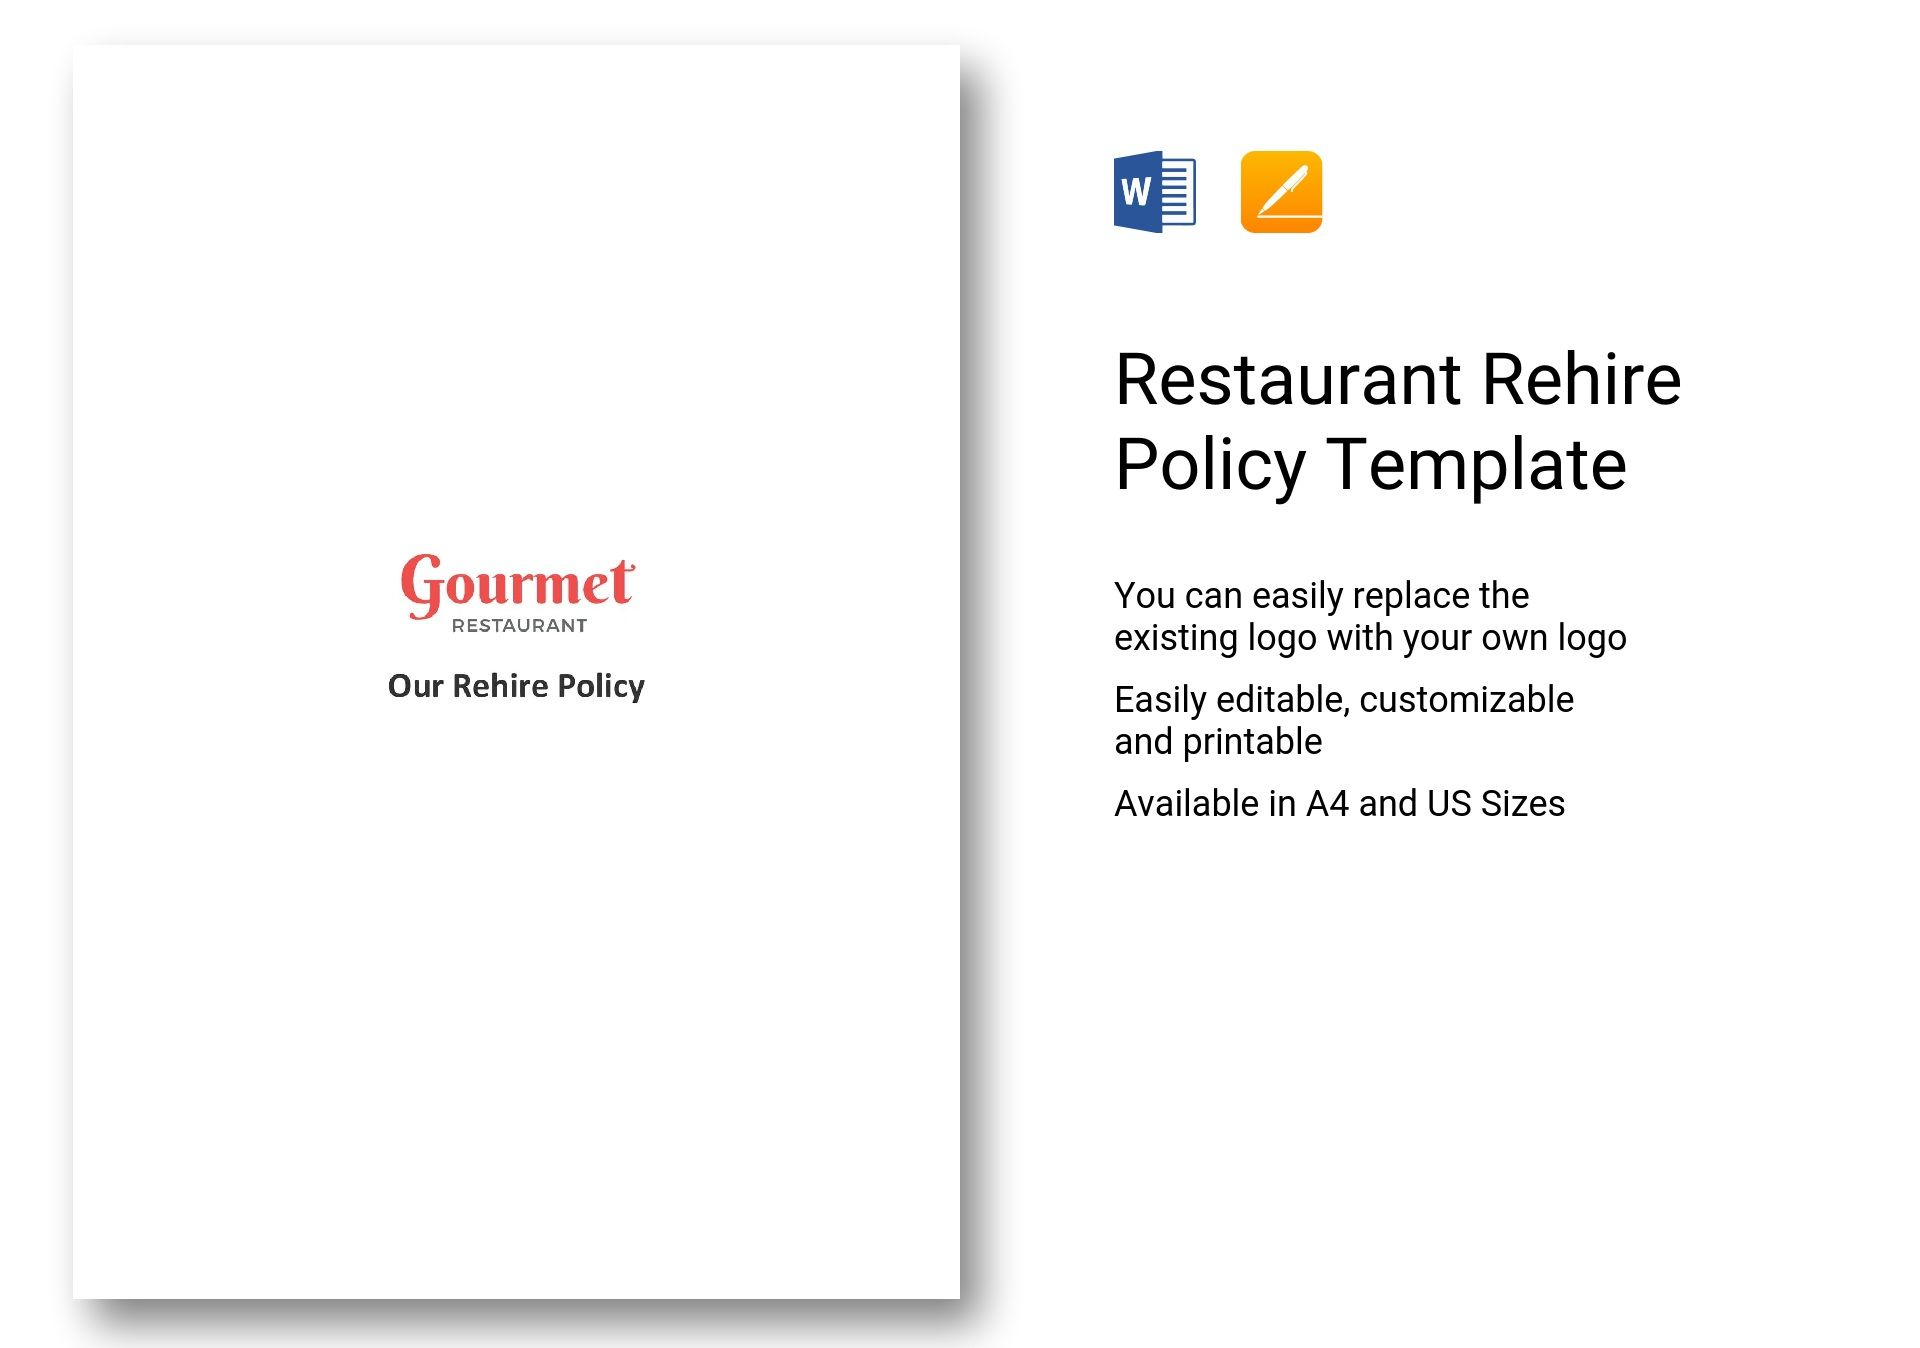 Restaurant Rehire Policy